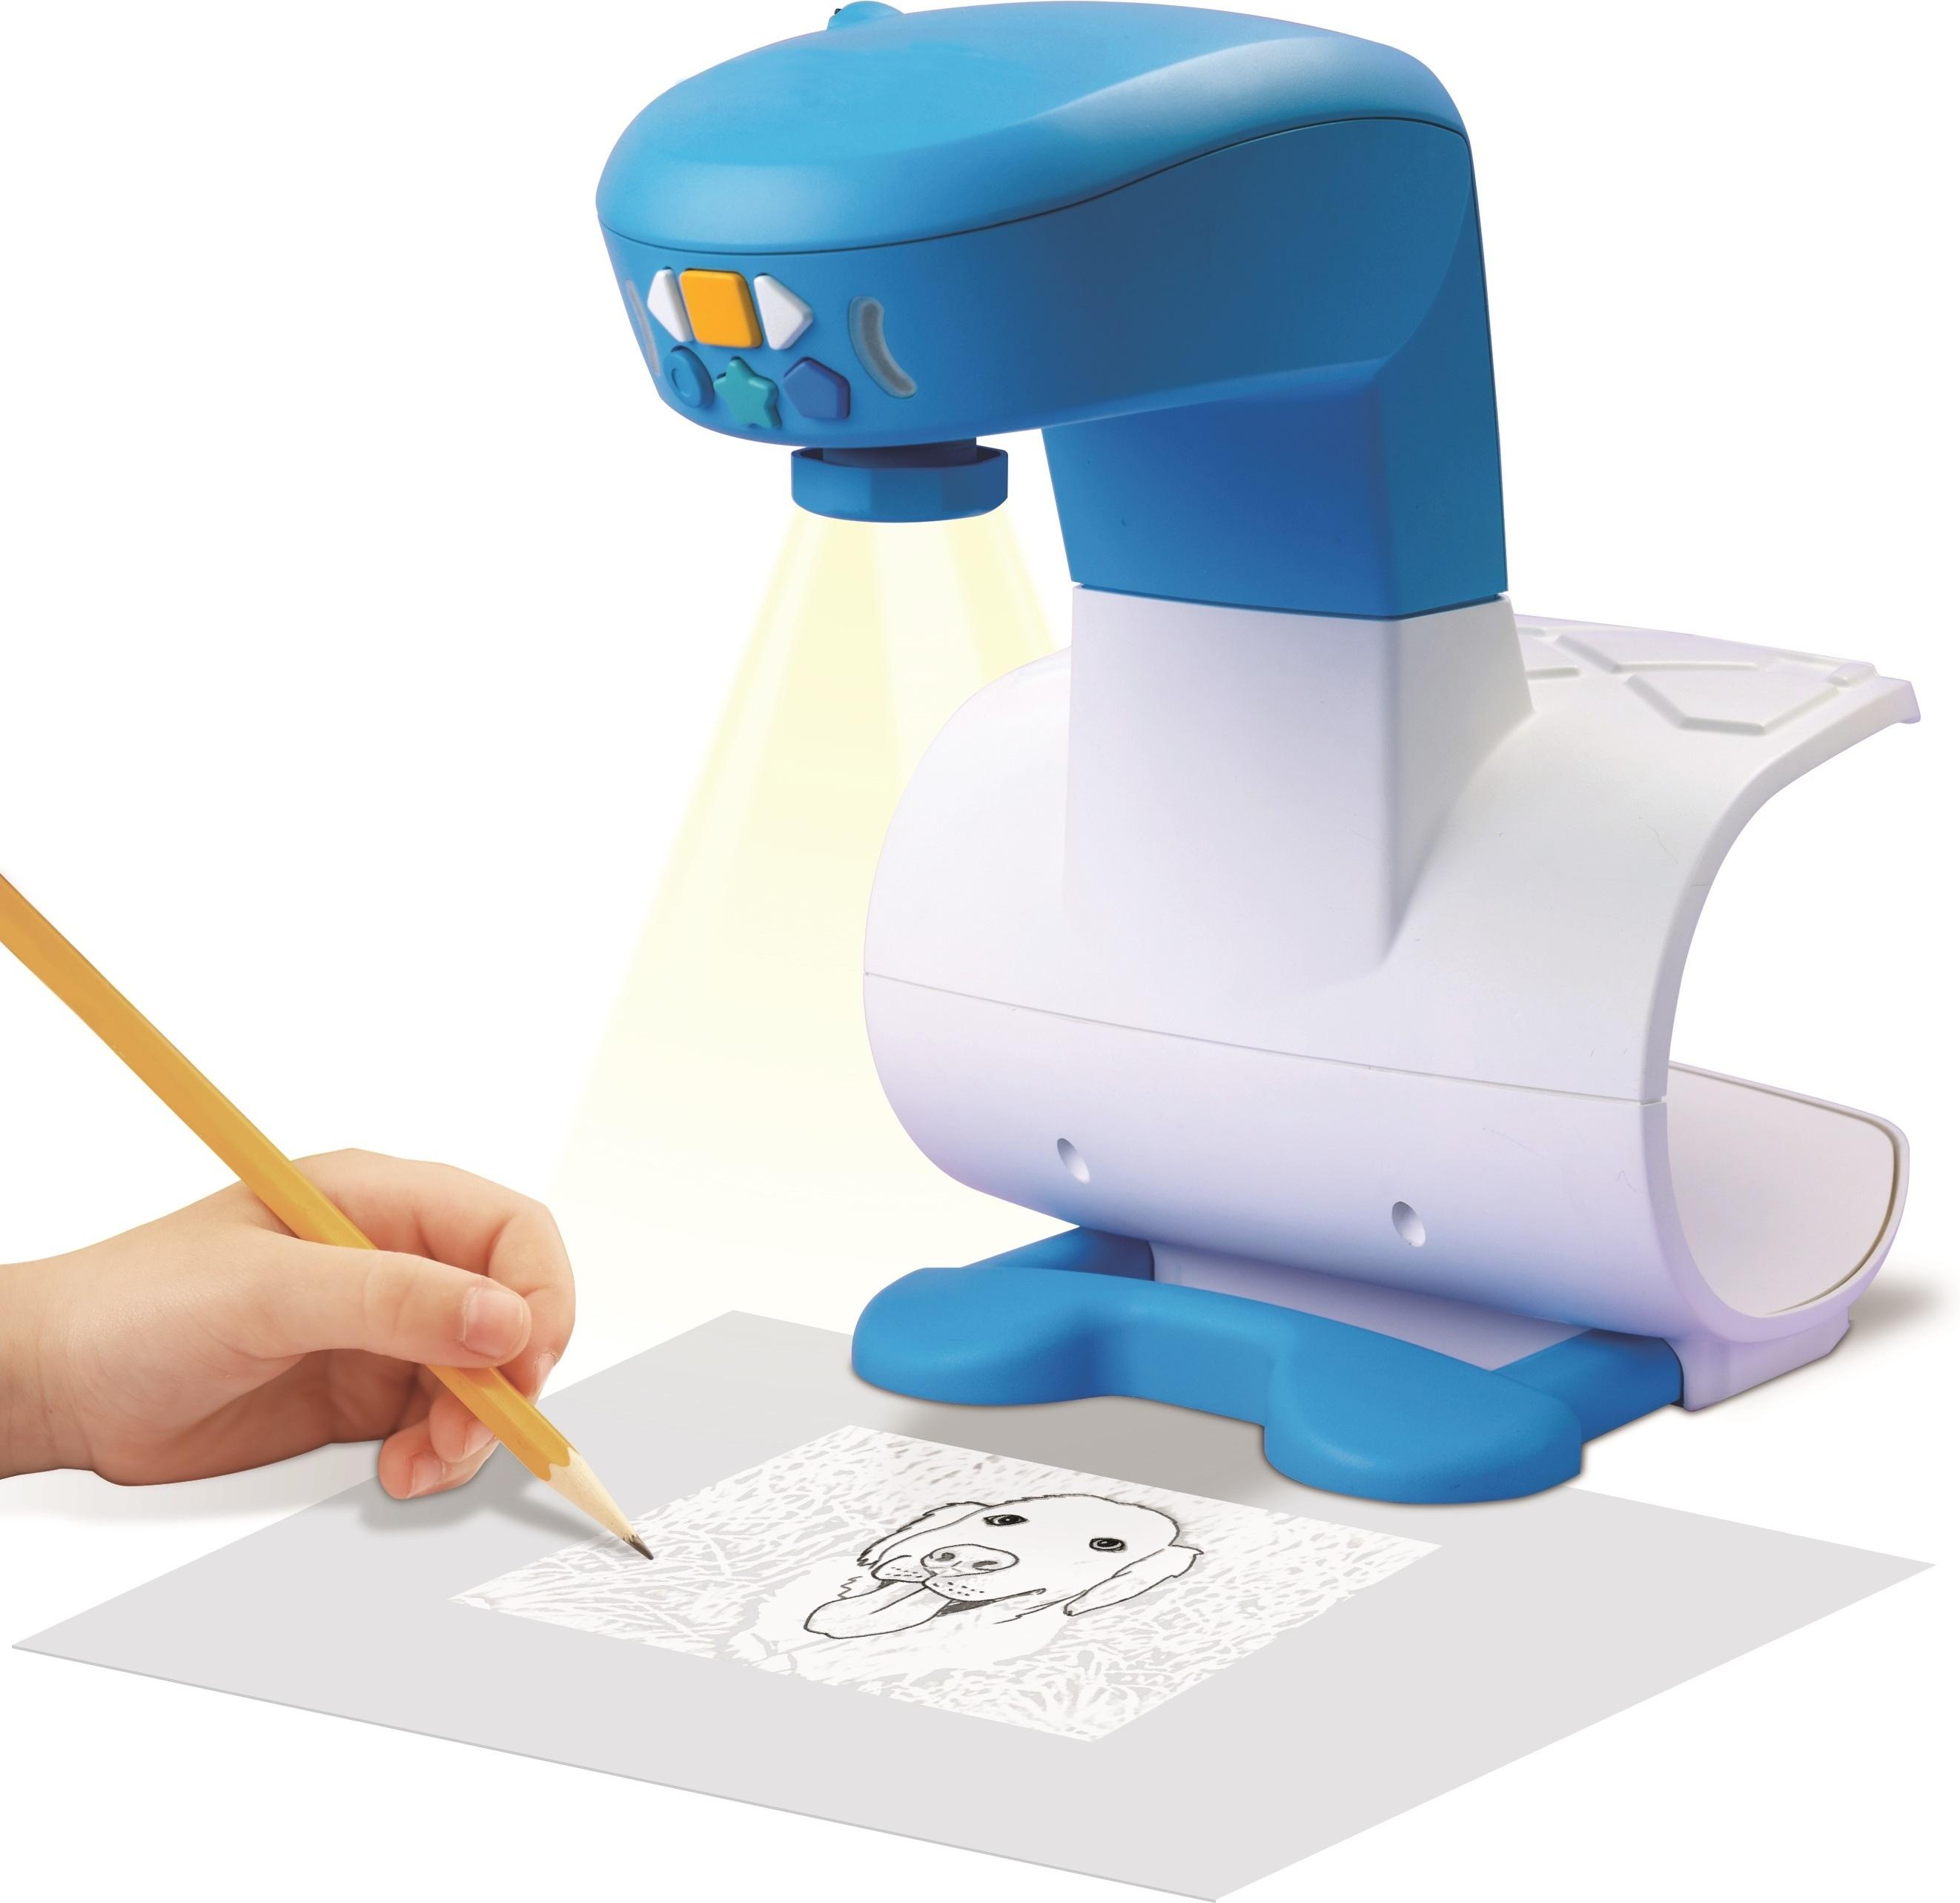 smART Sketcher -projektori – Helmet, korut ja koristeet – Askartelu – Luova leikki ja askartelu – Lelut – Verkkokauppa.com